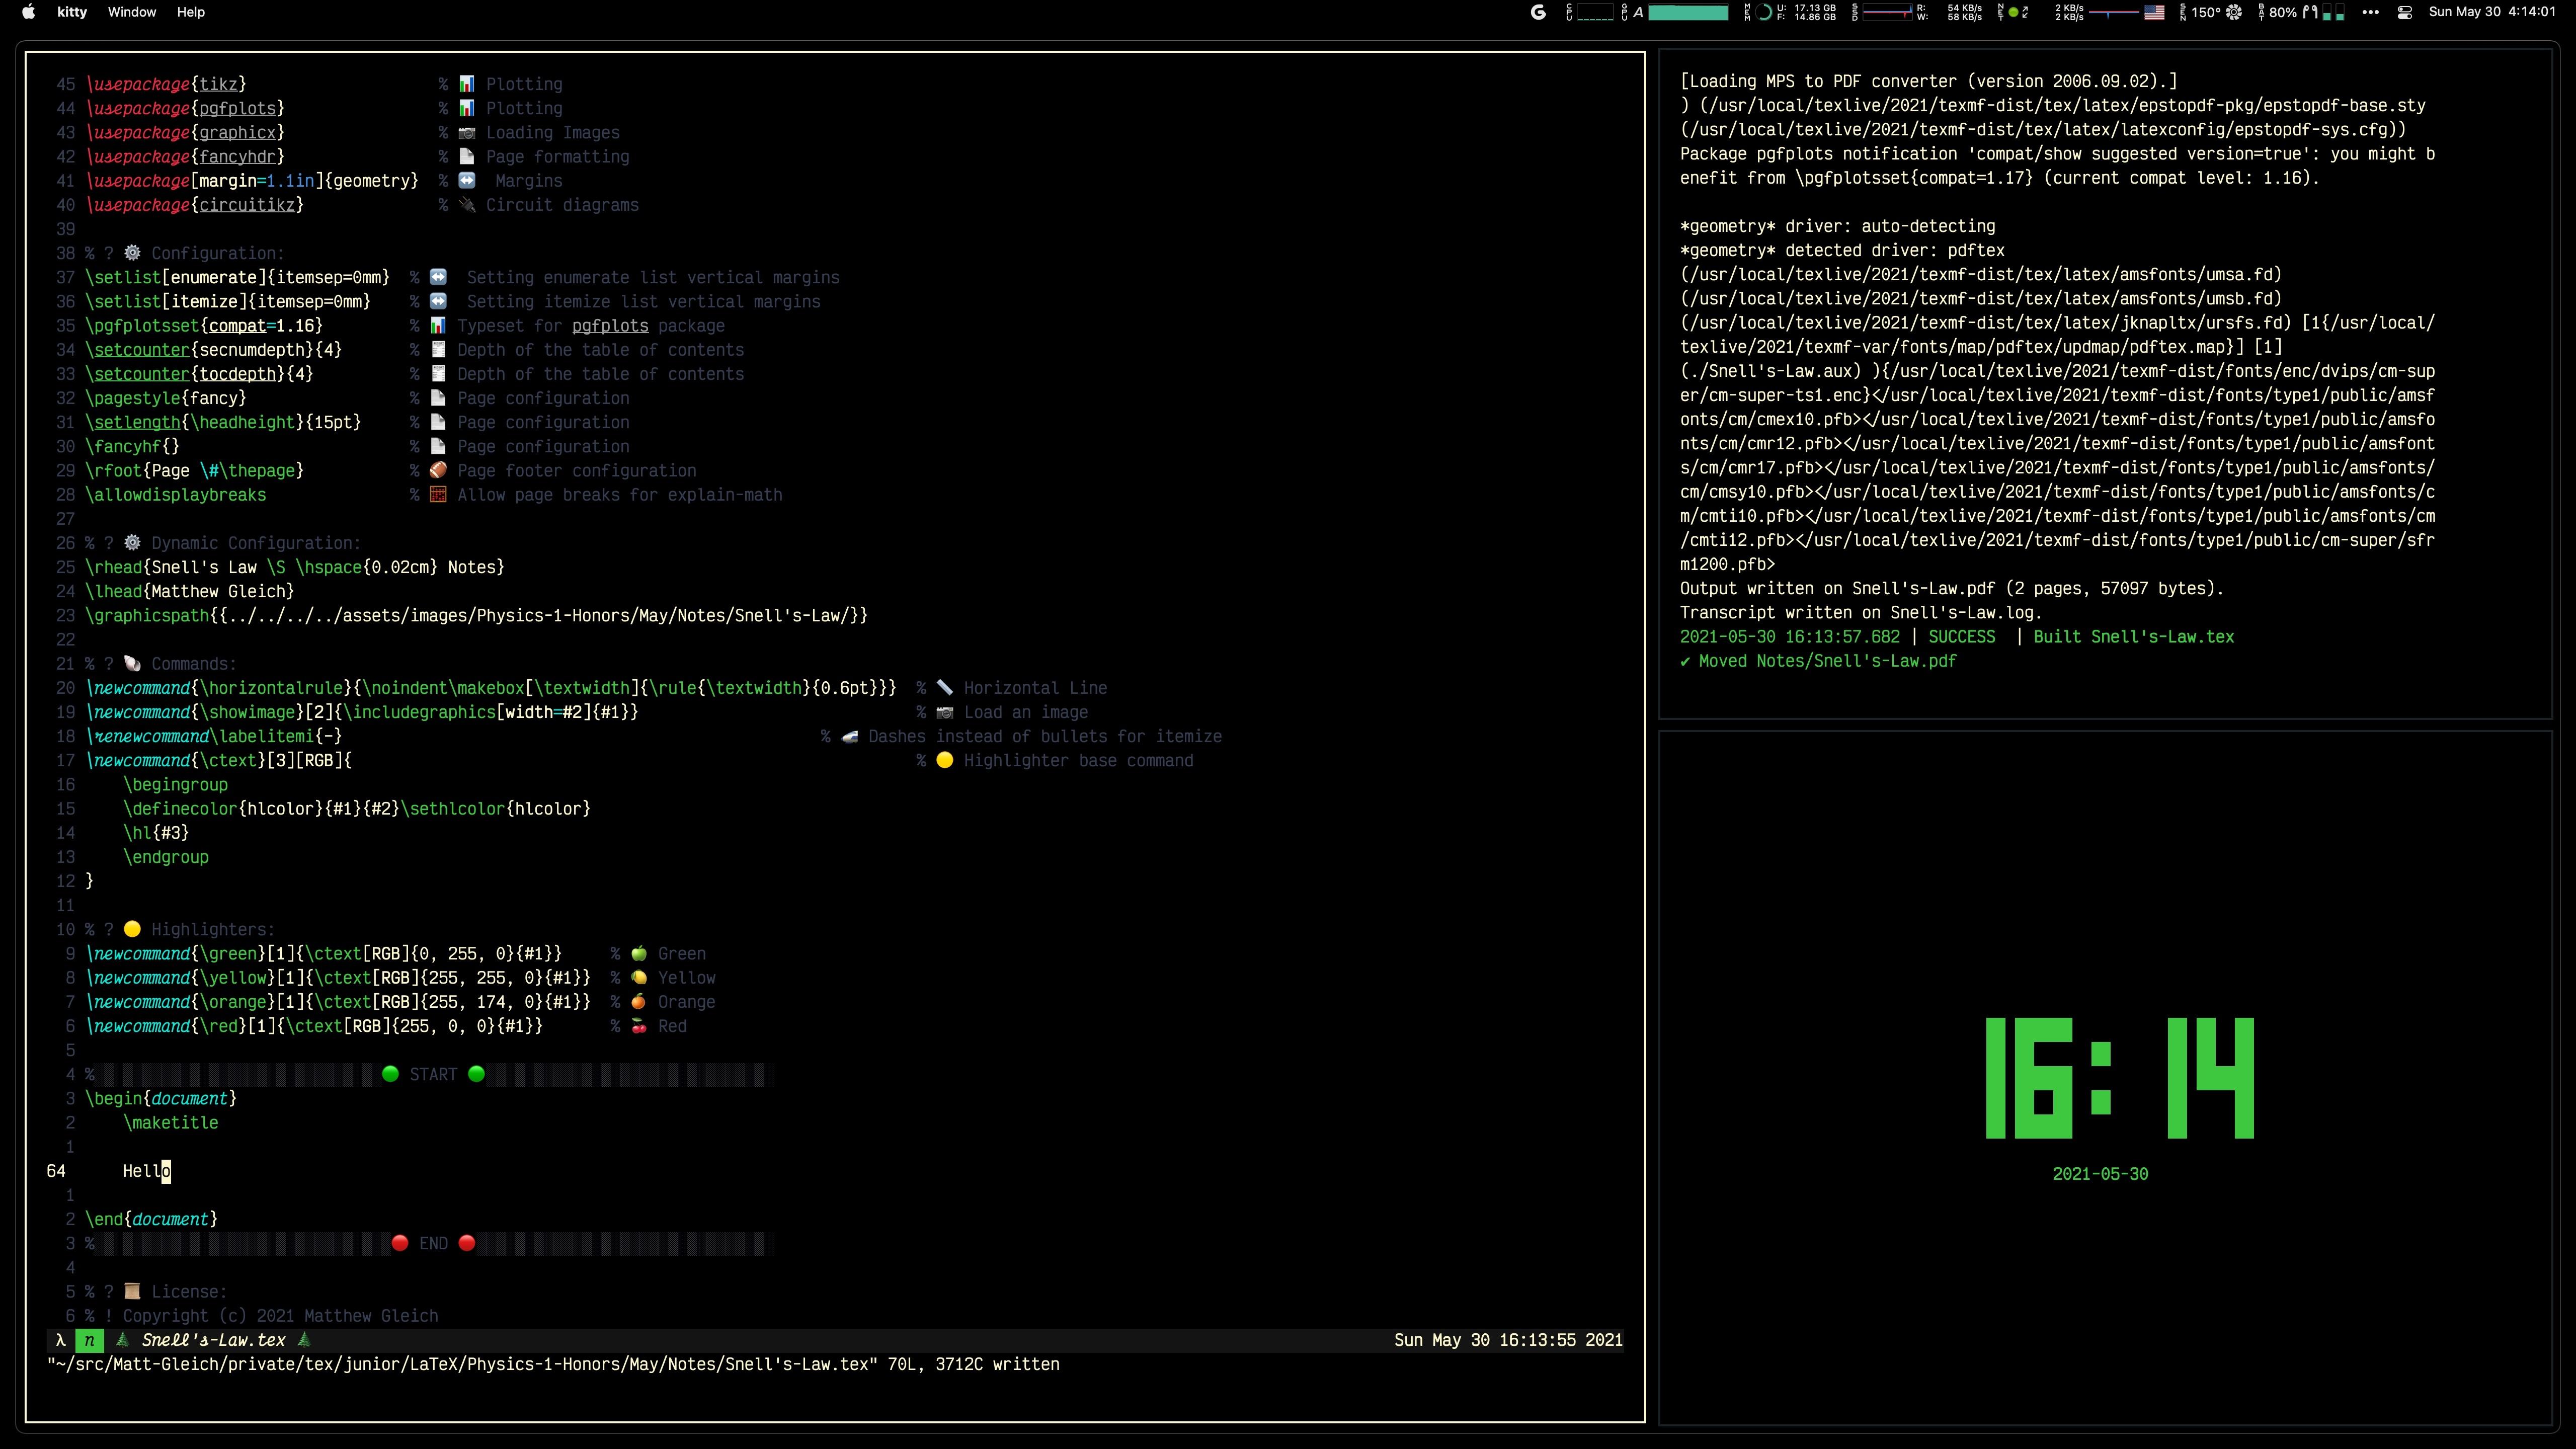 https://cloud-2gxzf1hcn-hack-club-bot.vercel.app/0screen_shot_2021-05-30_at_4.14.01_pm.jpg